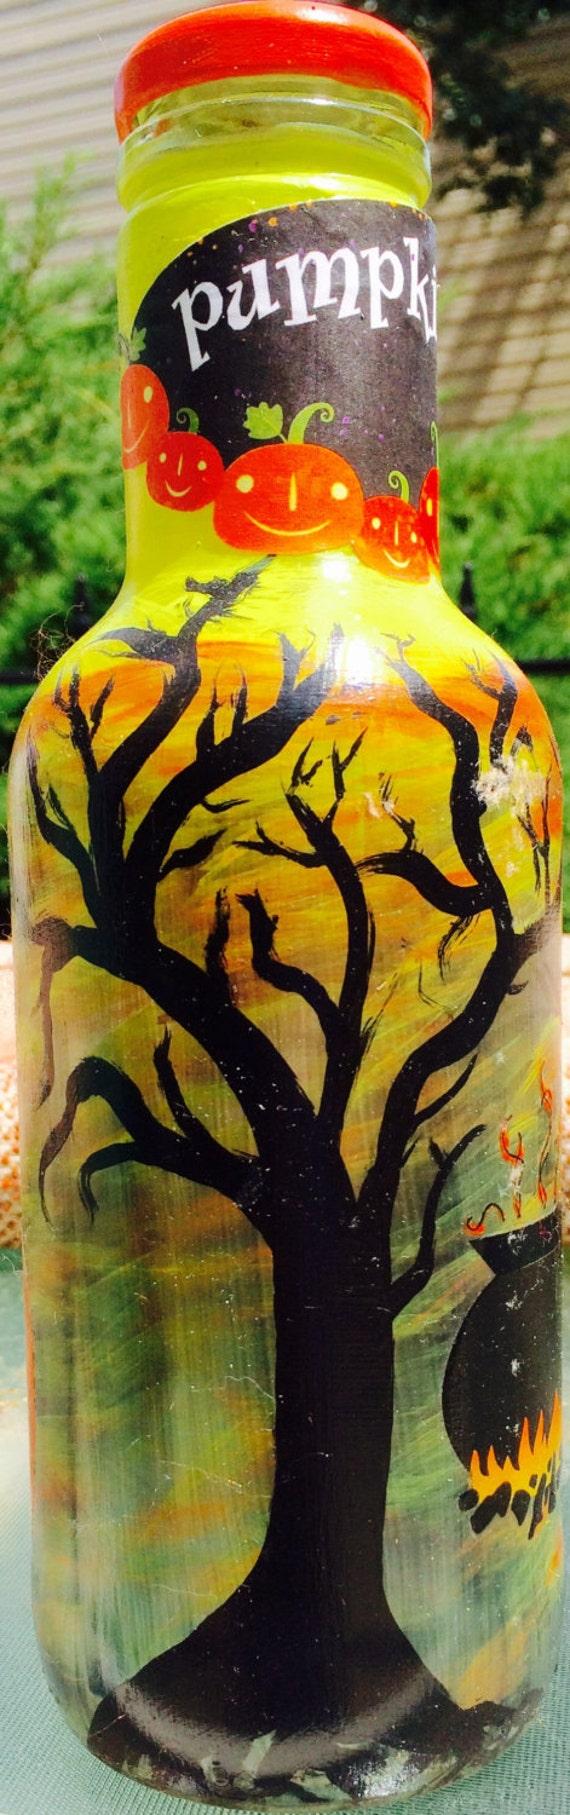 Halloween Decorated Bottle